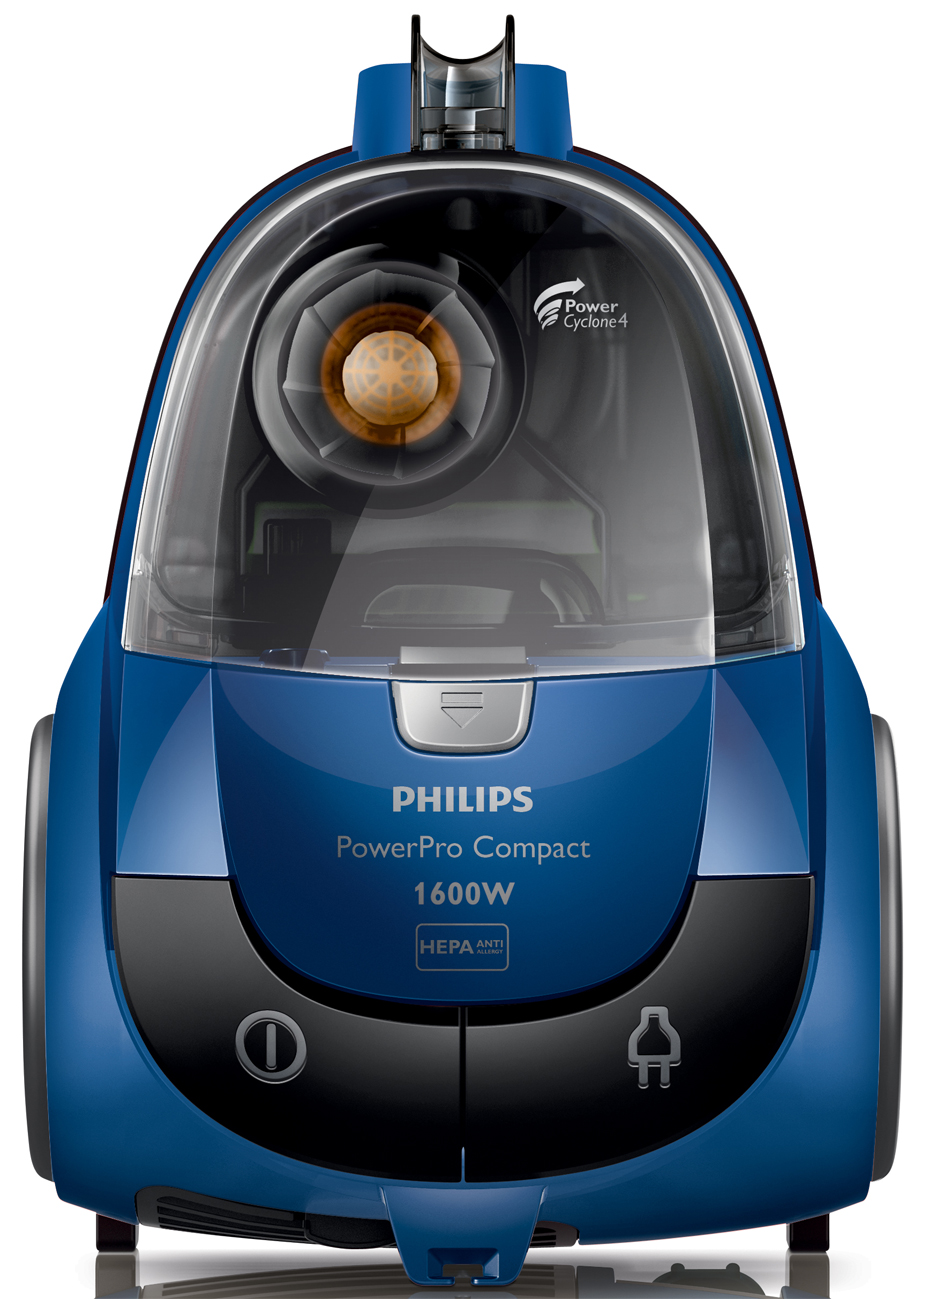 staubsauger philips powerpro compact hohe leistung bei. Black Bedroom Furniture Sets. Home Design Ideas